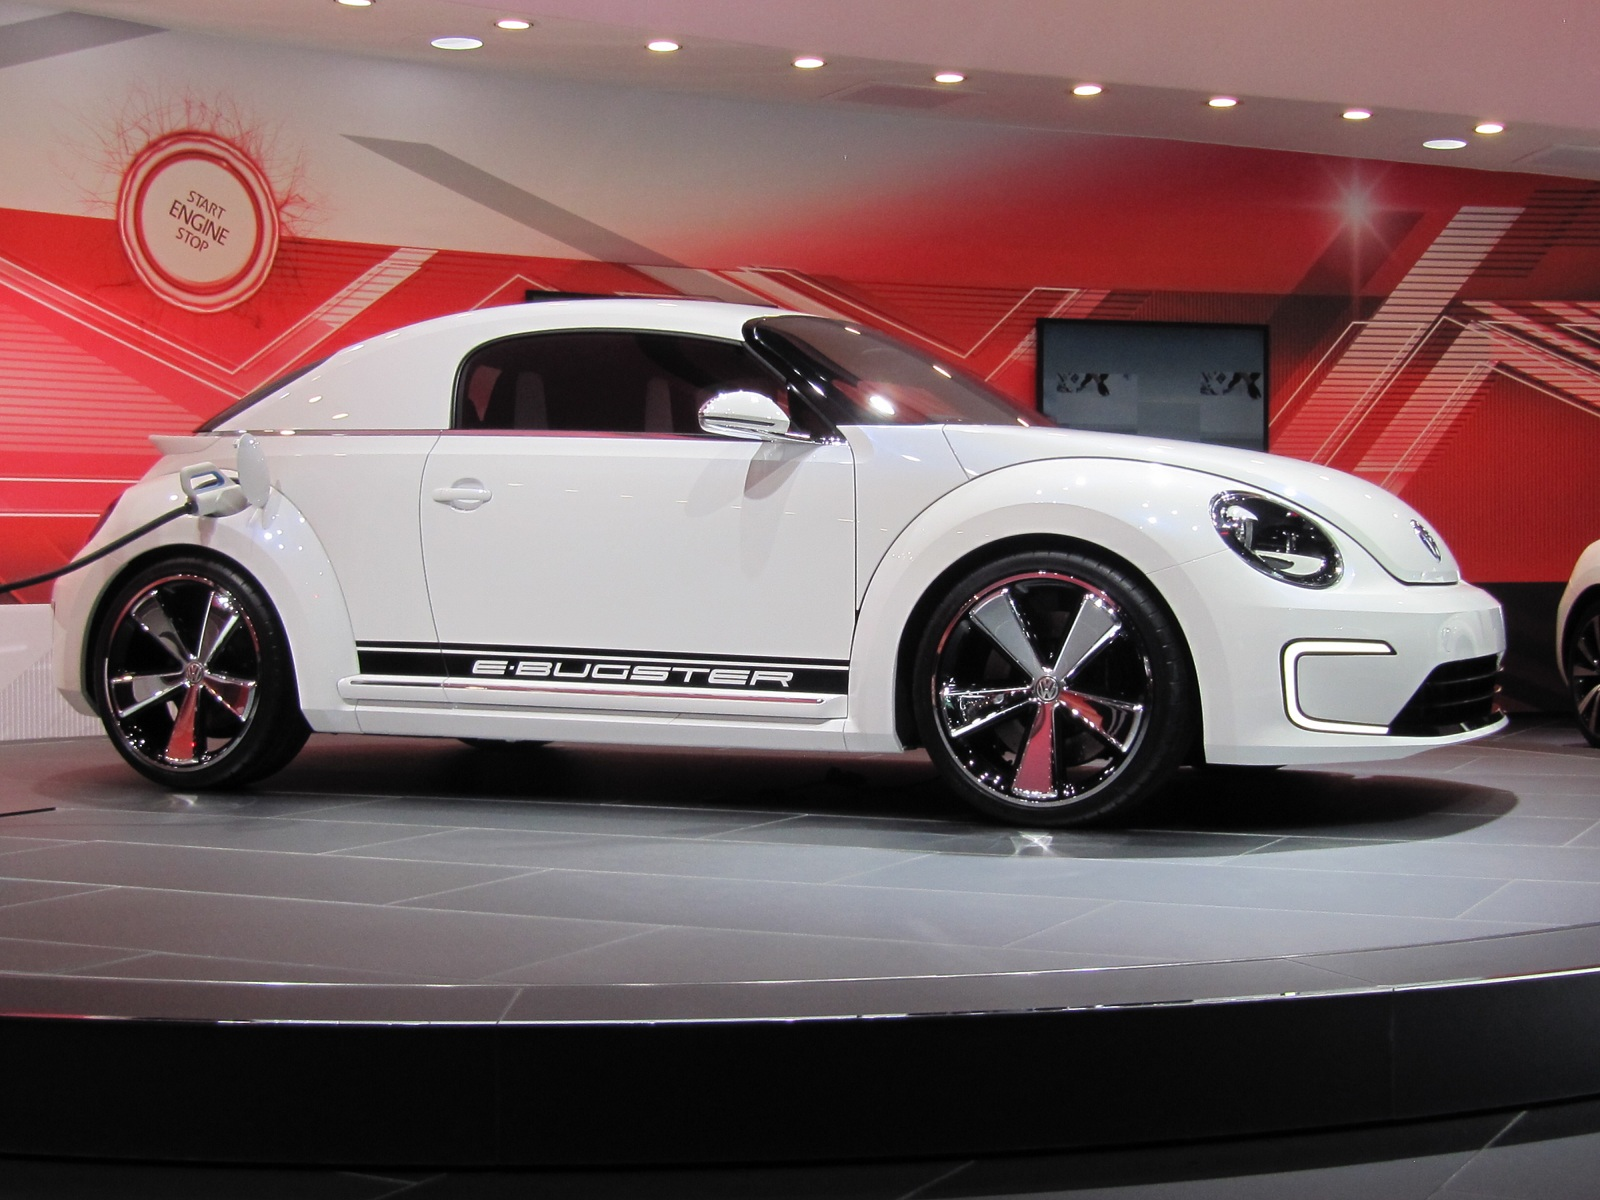 2013 vw e bugster electric concept 2012 detroit auto show video. Black Bedroom Furniture Sets. Home Design Ideas